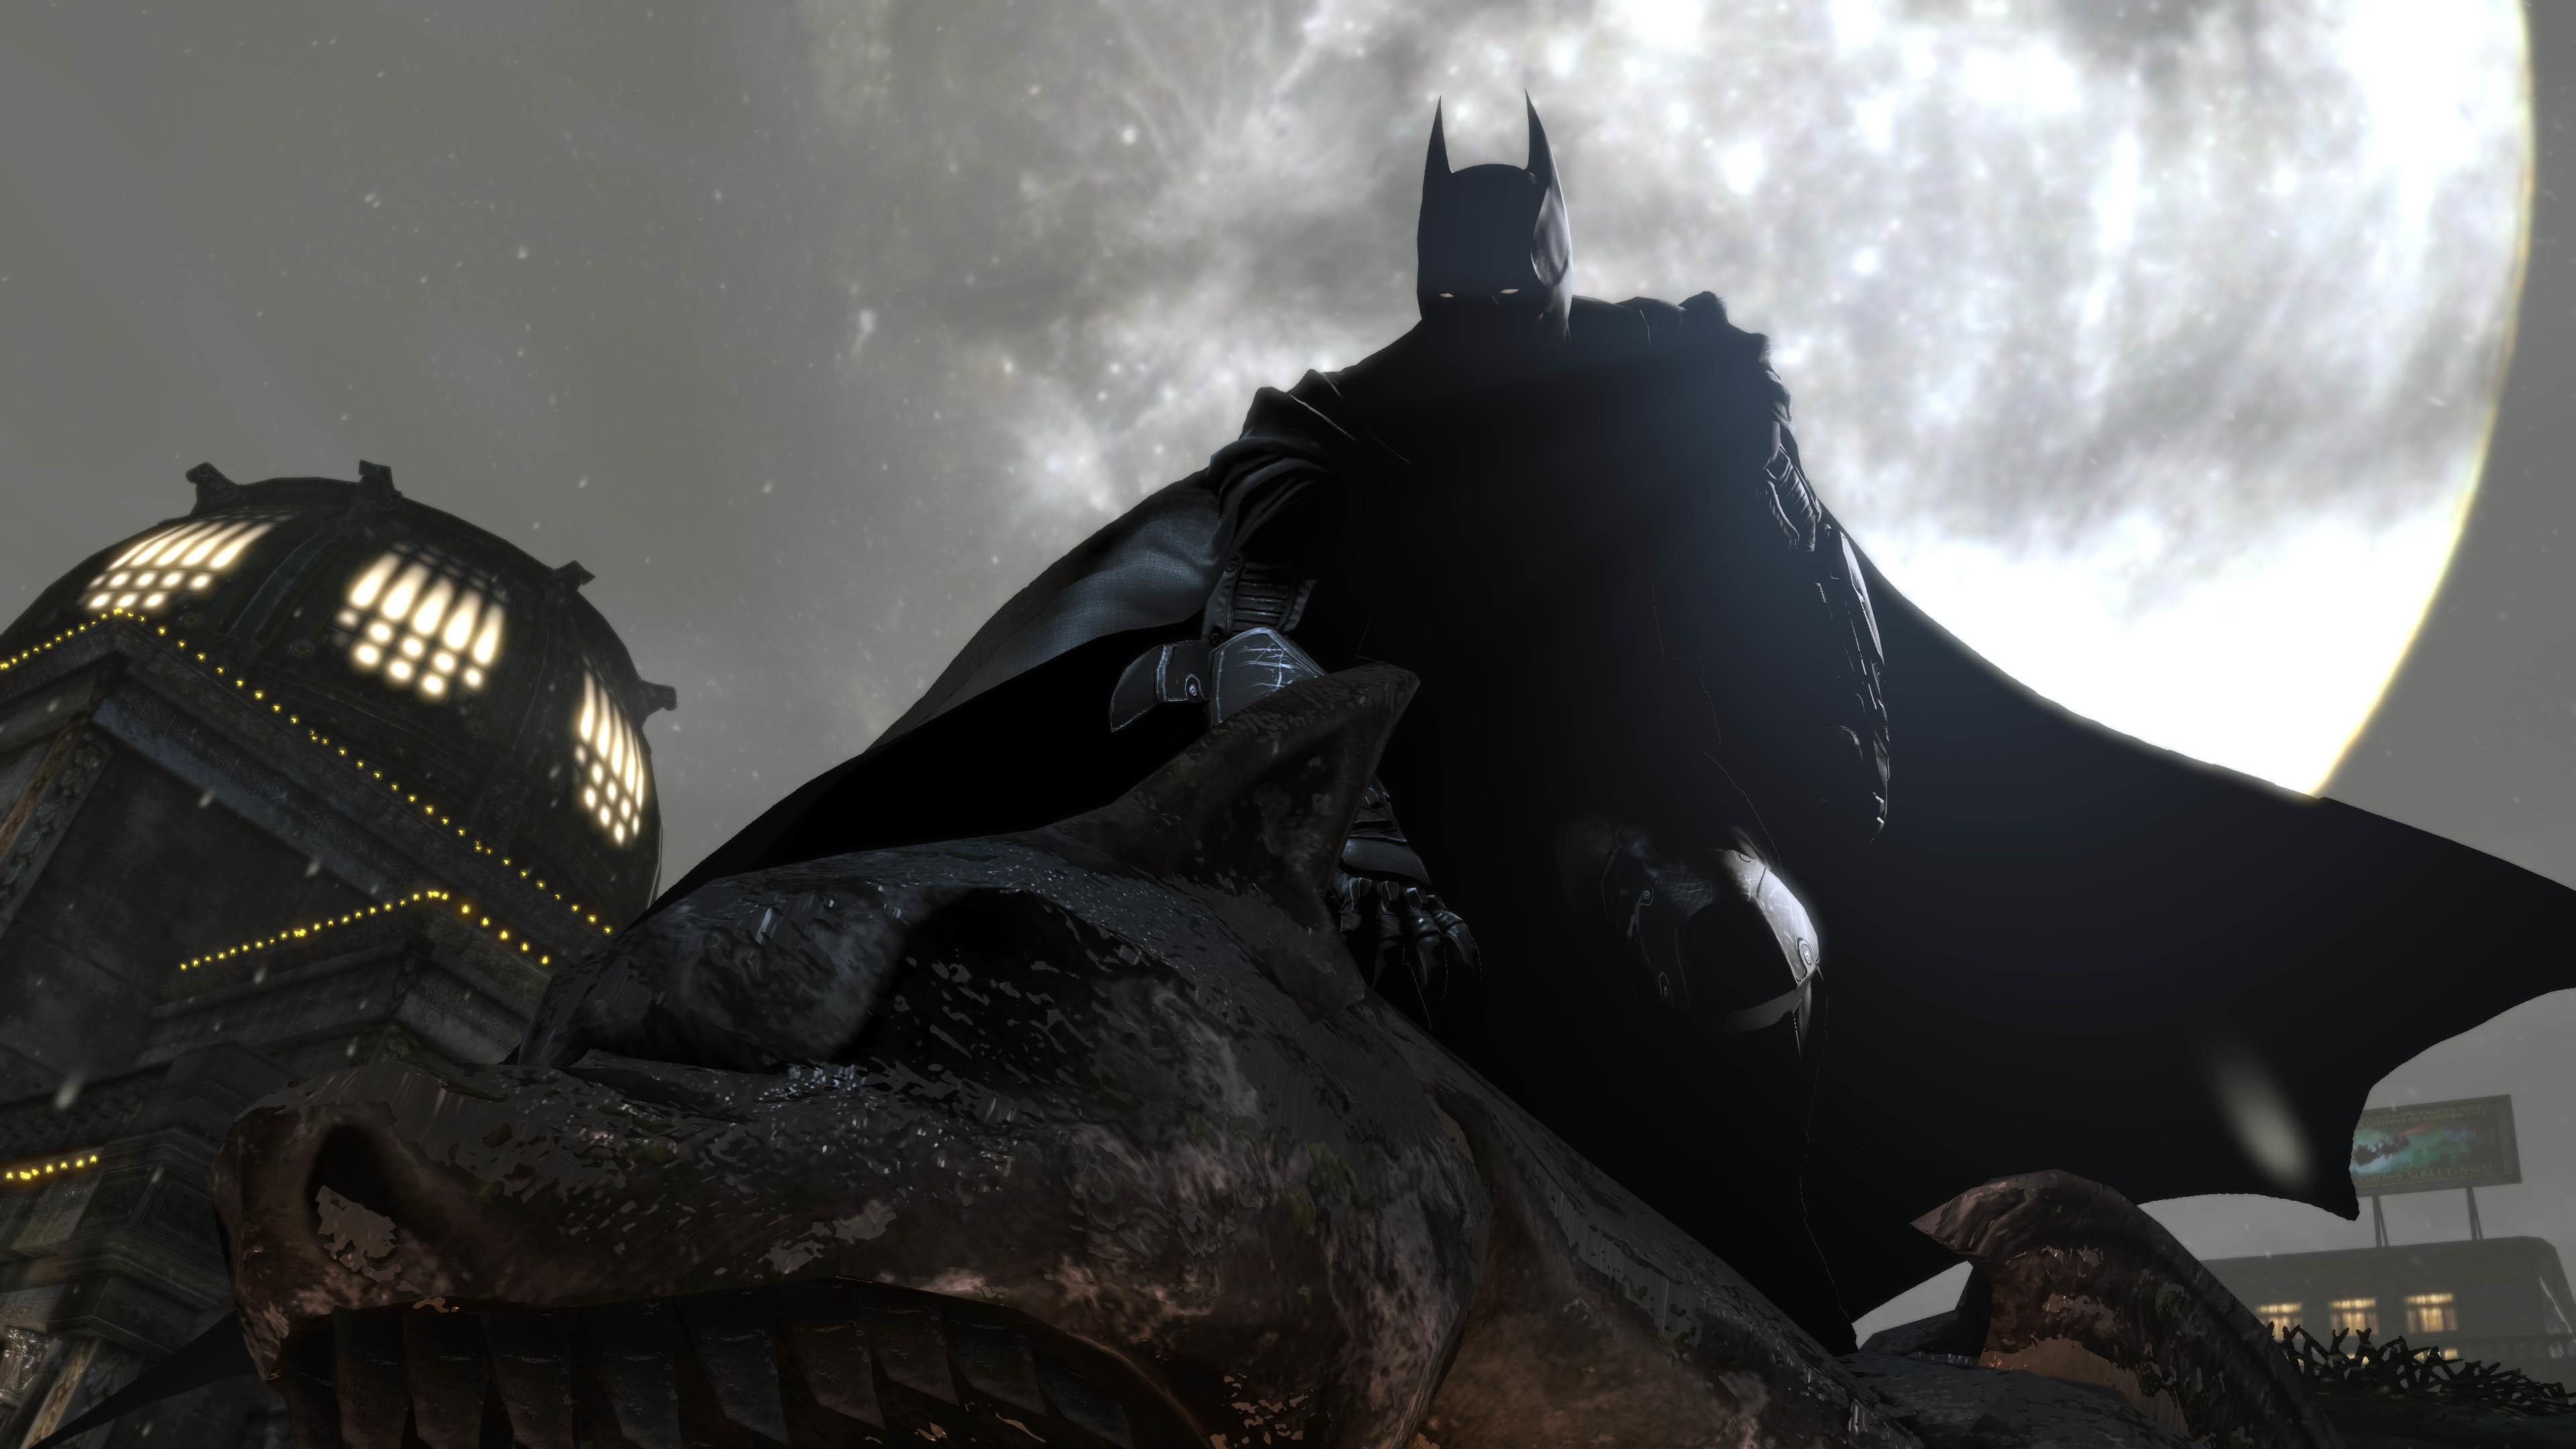 Batman Wallpaper 4K – – 4K 16/9 (Ultra HD, UHD .